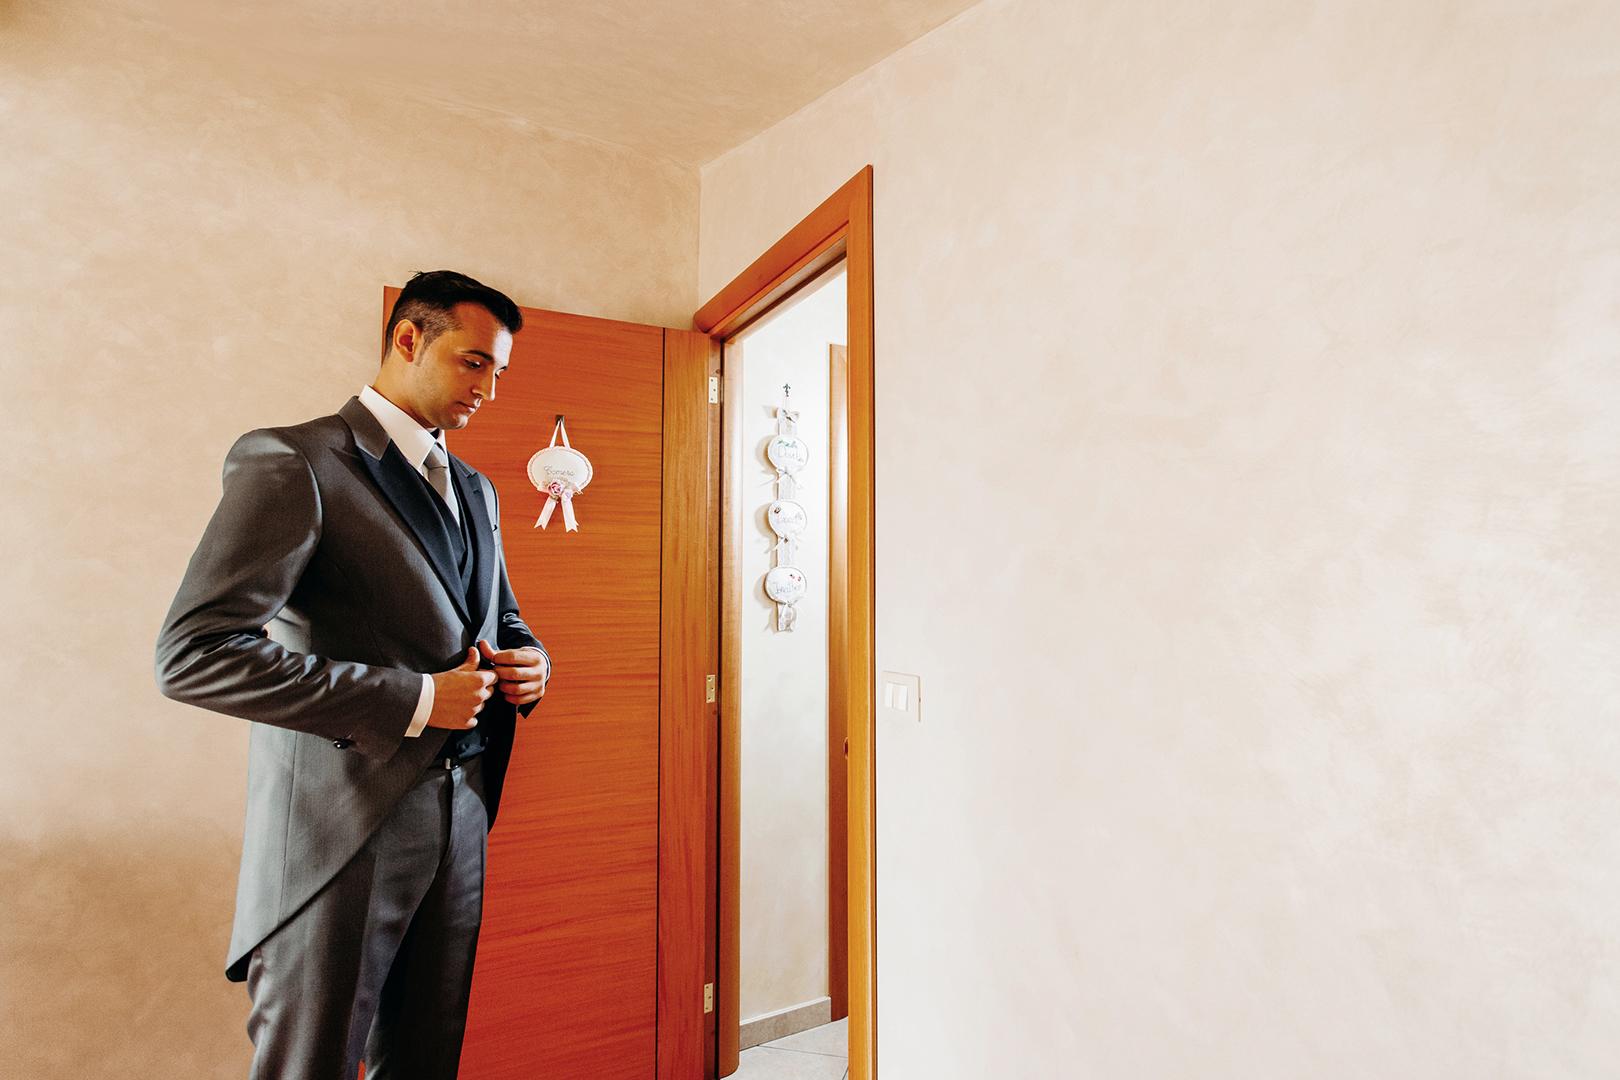 15 gianni-lepore-sposo-groom-lucera-fotografo-wedding-abito